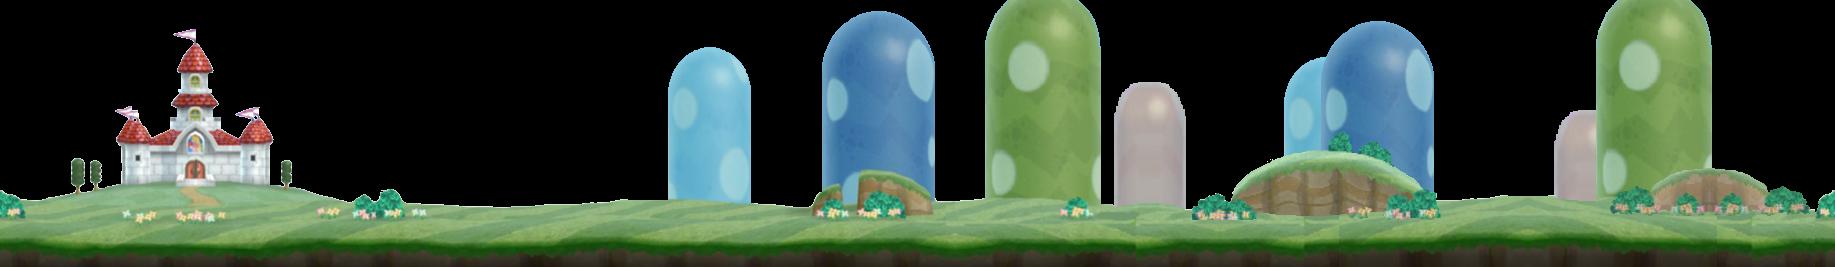 New Super Mario Bros Wii Overworld Bg 1 By Somarimarionicteam On